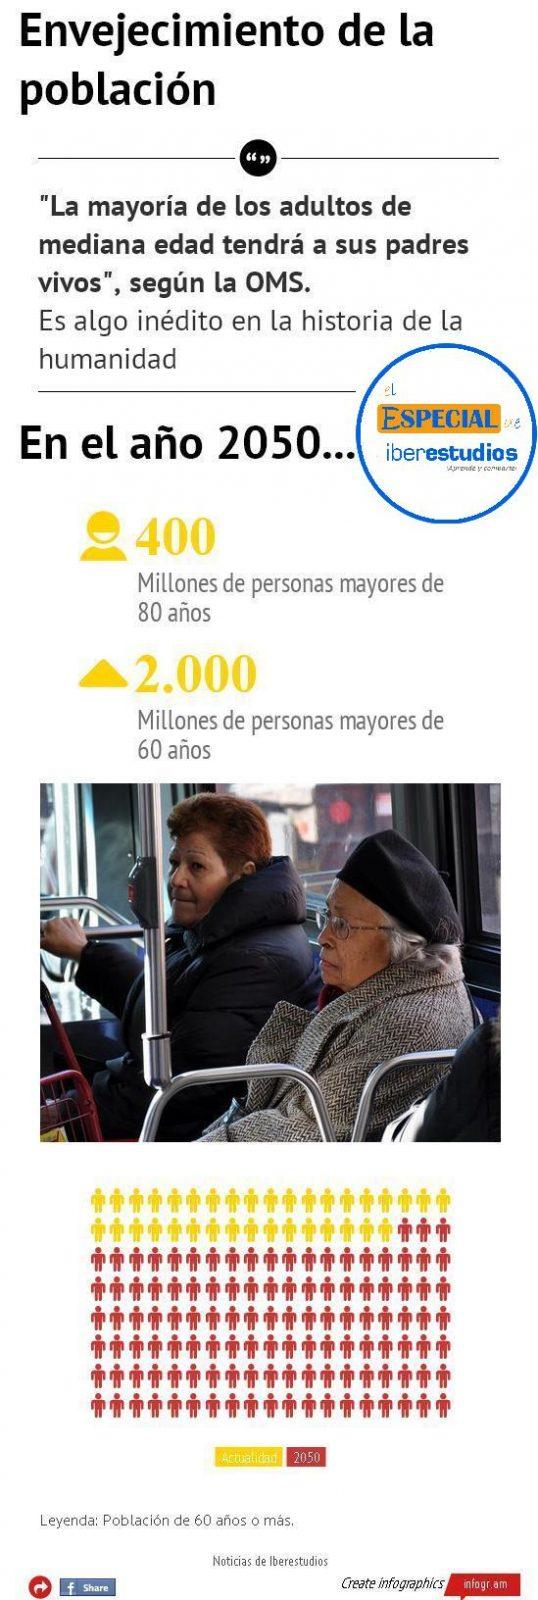 infografia envejecimiento poblacion